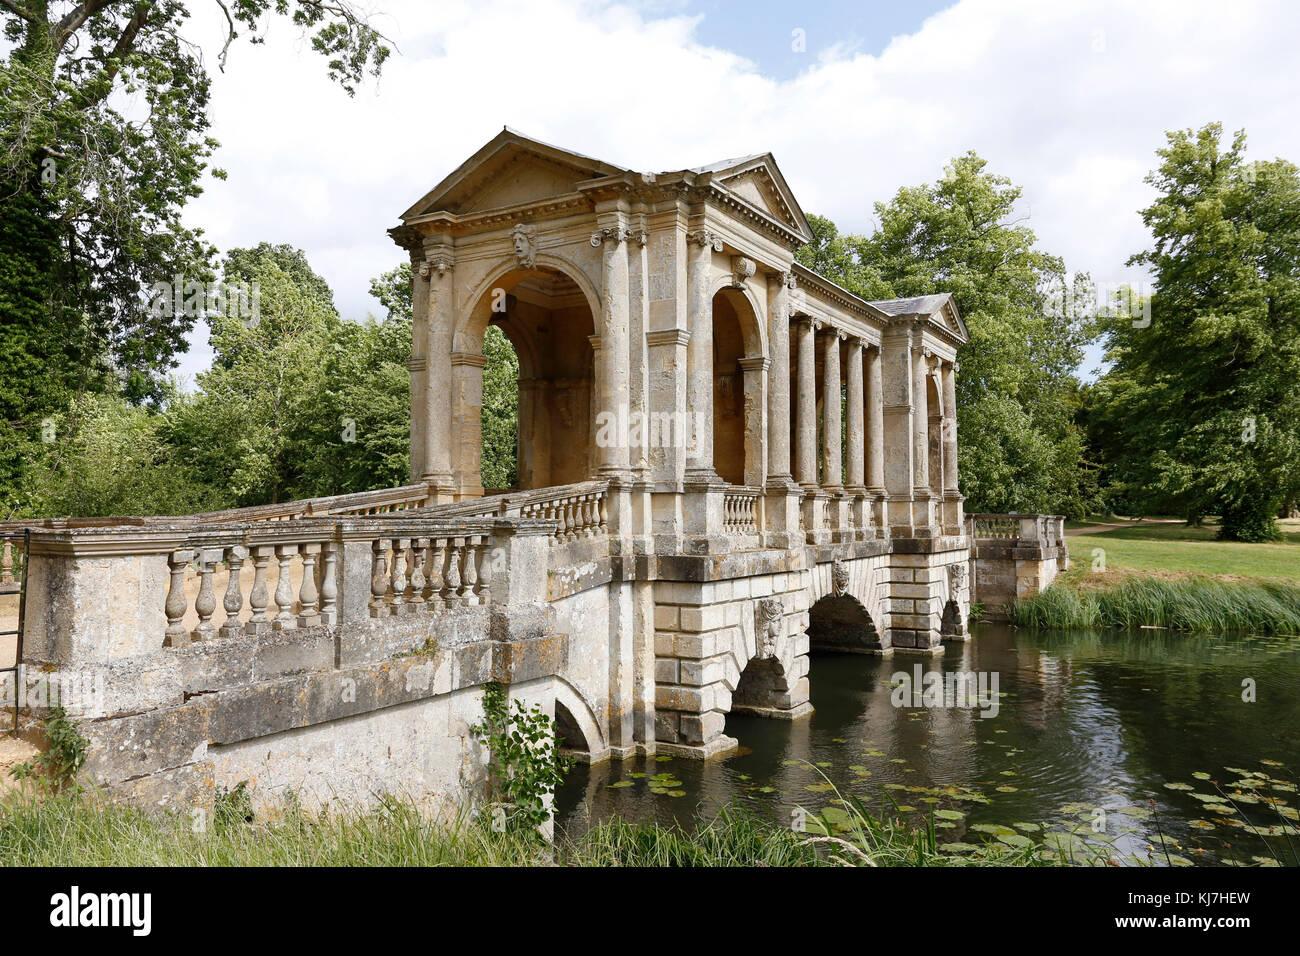 The Palladian Bridge at Stowe Gardens,Buckinghamshire. - Stock Image